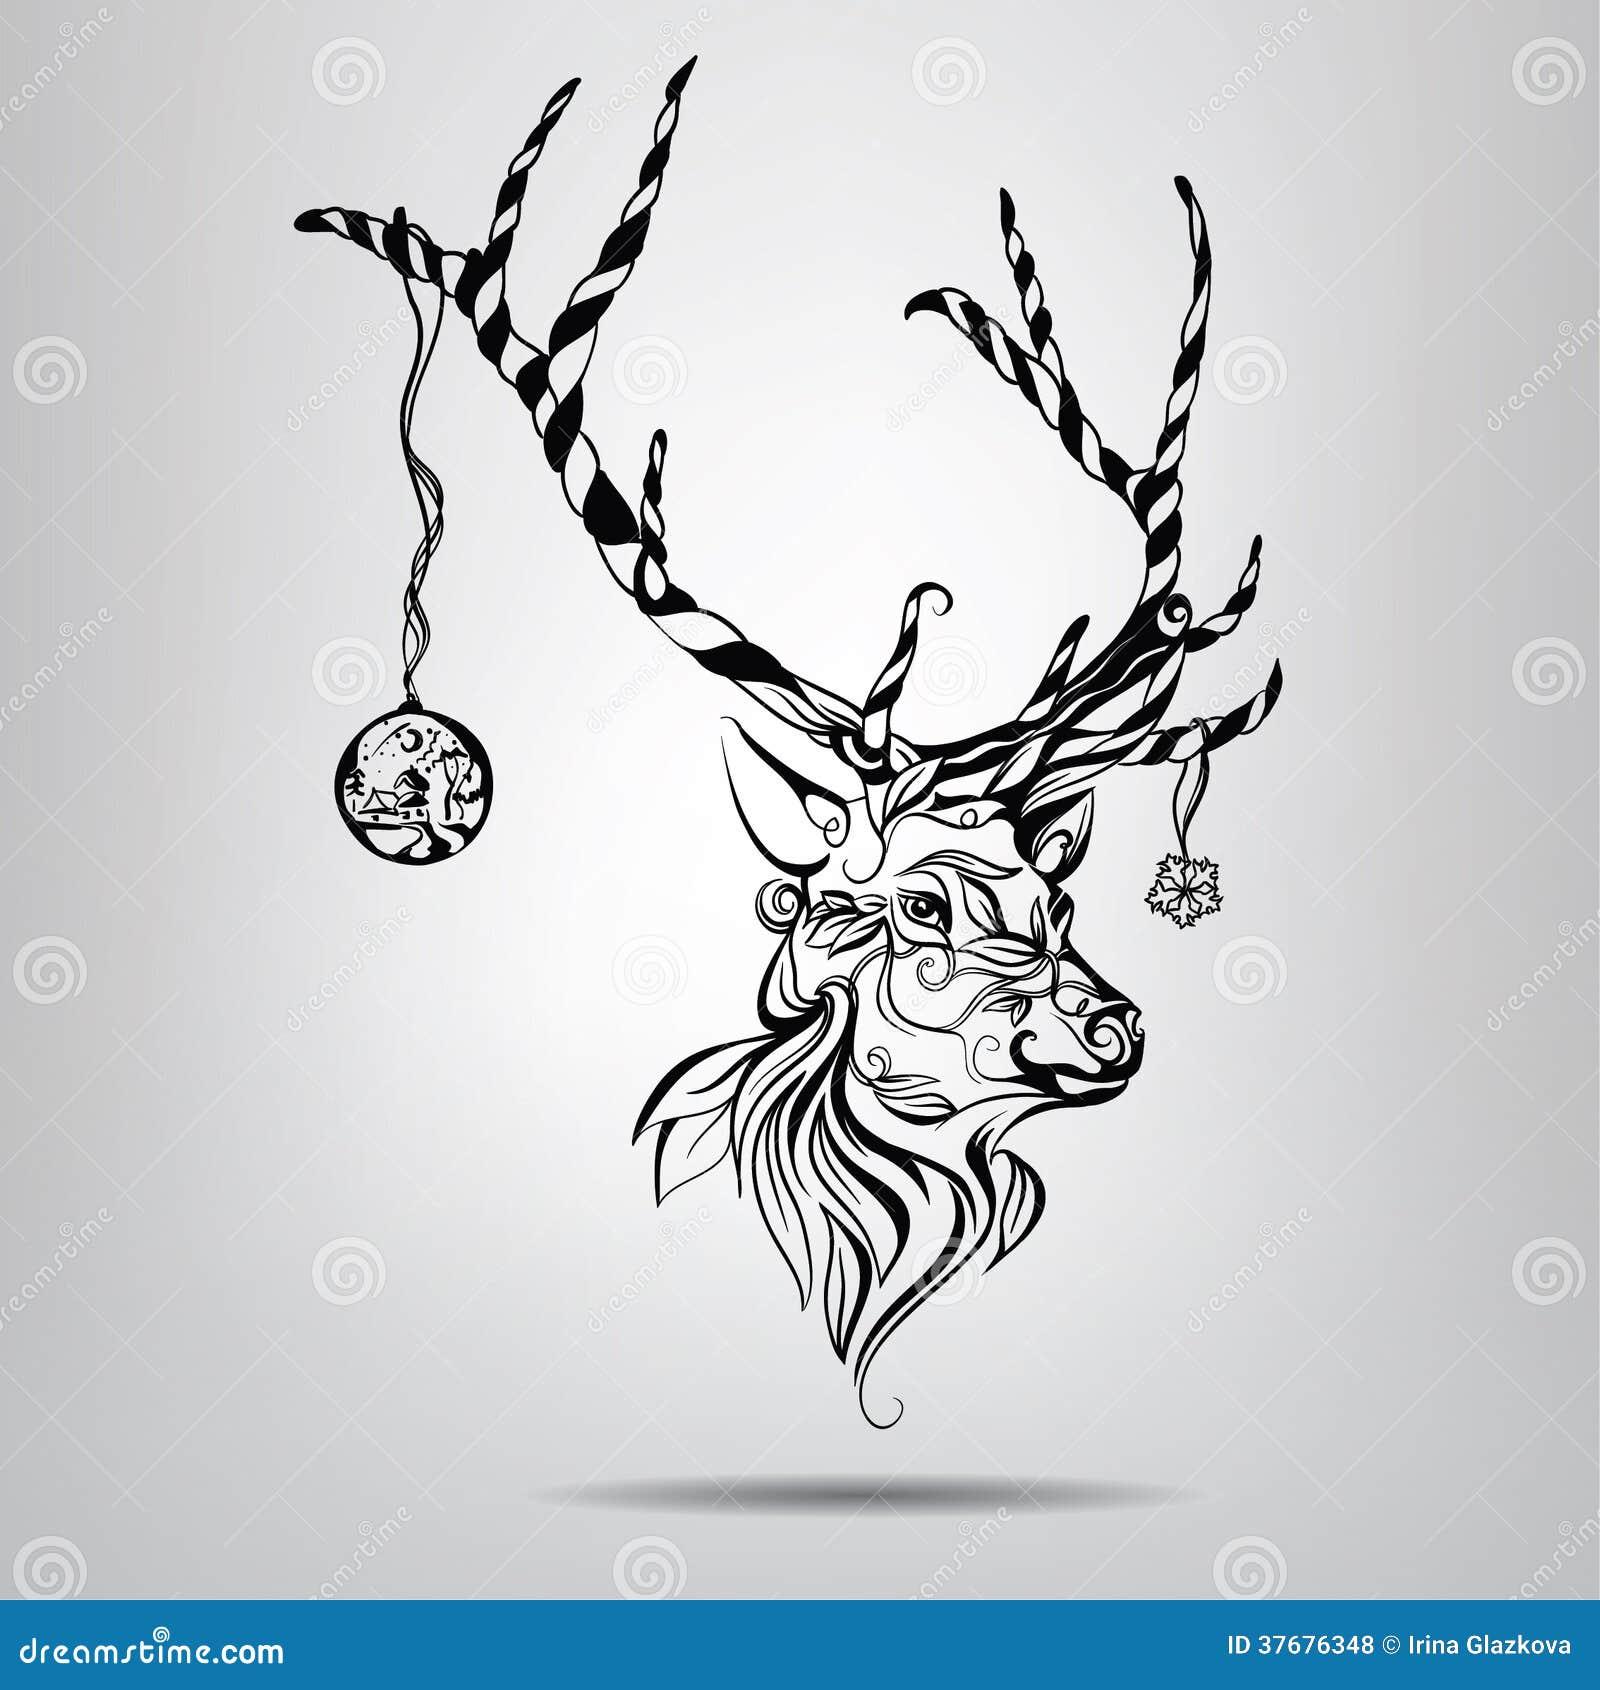 Deer illustration black and white - photo#37